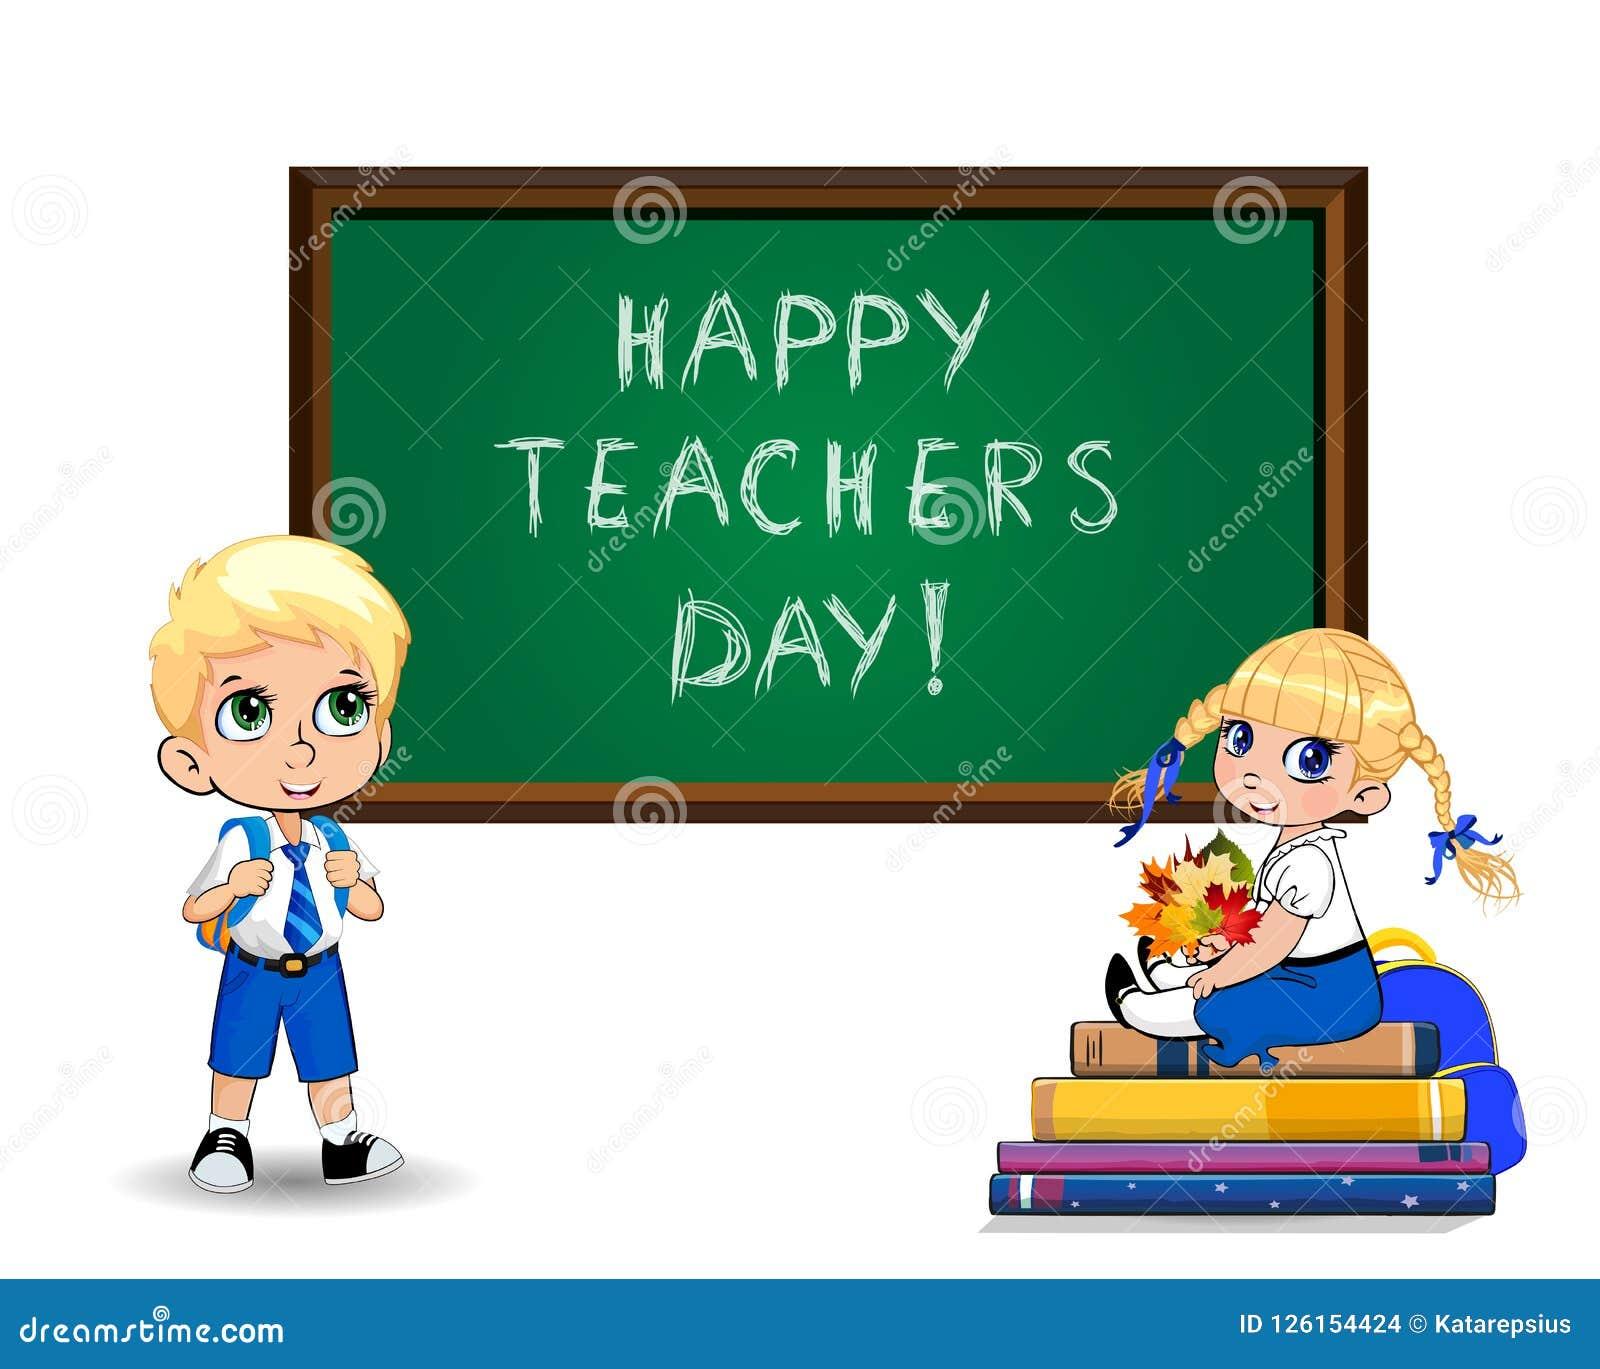 Happy Teachers Day Greeting Card With Cute Cartoon School Kids On